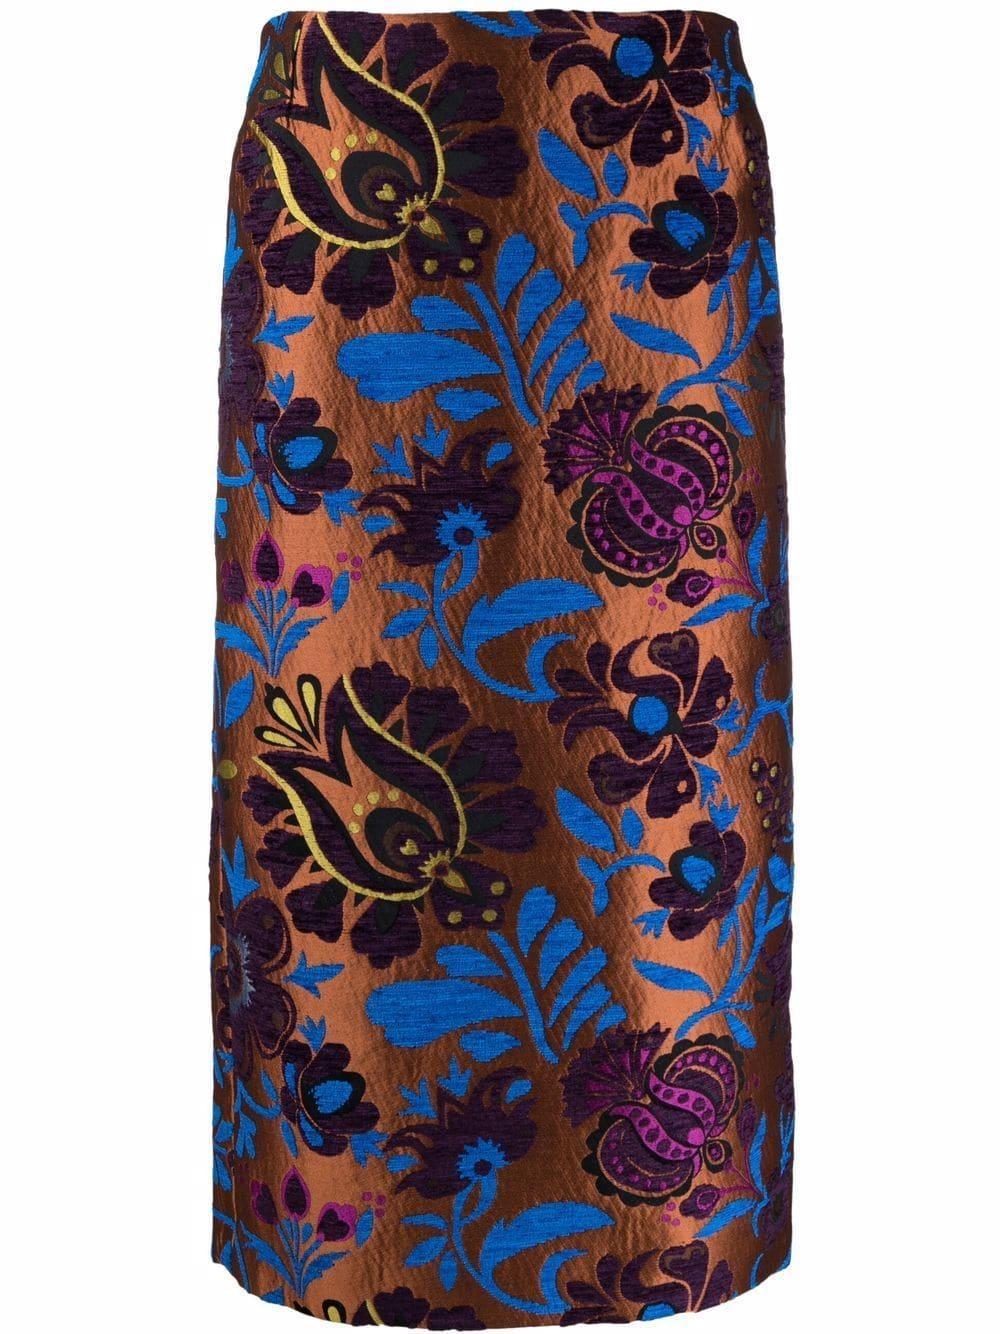 Floral Jacquard Pencil Skirt Item # SKI0011-JAC025